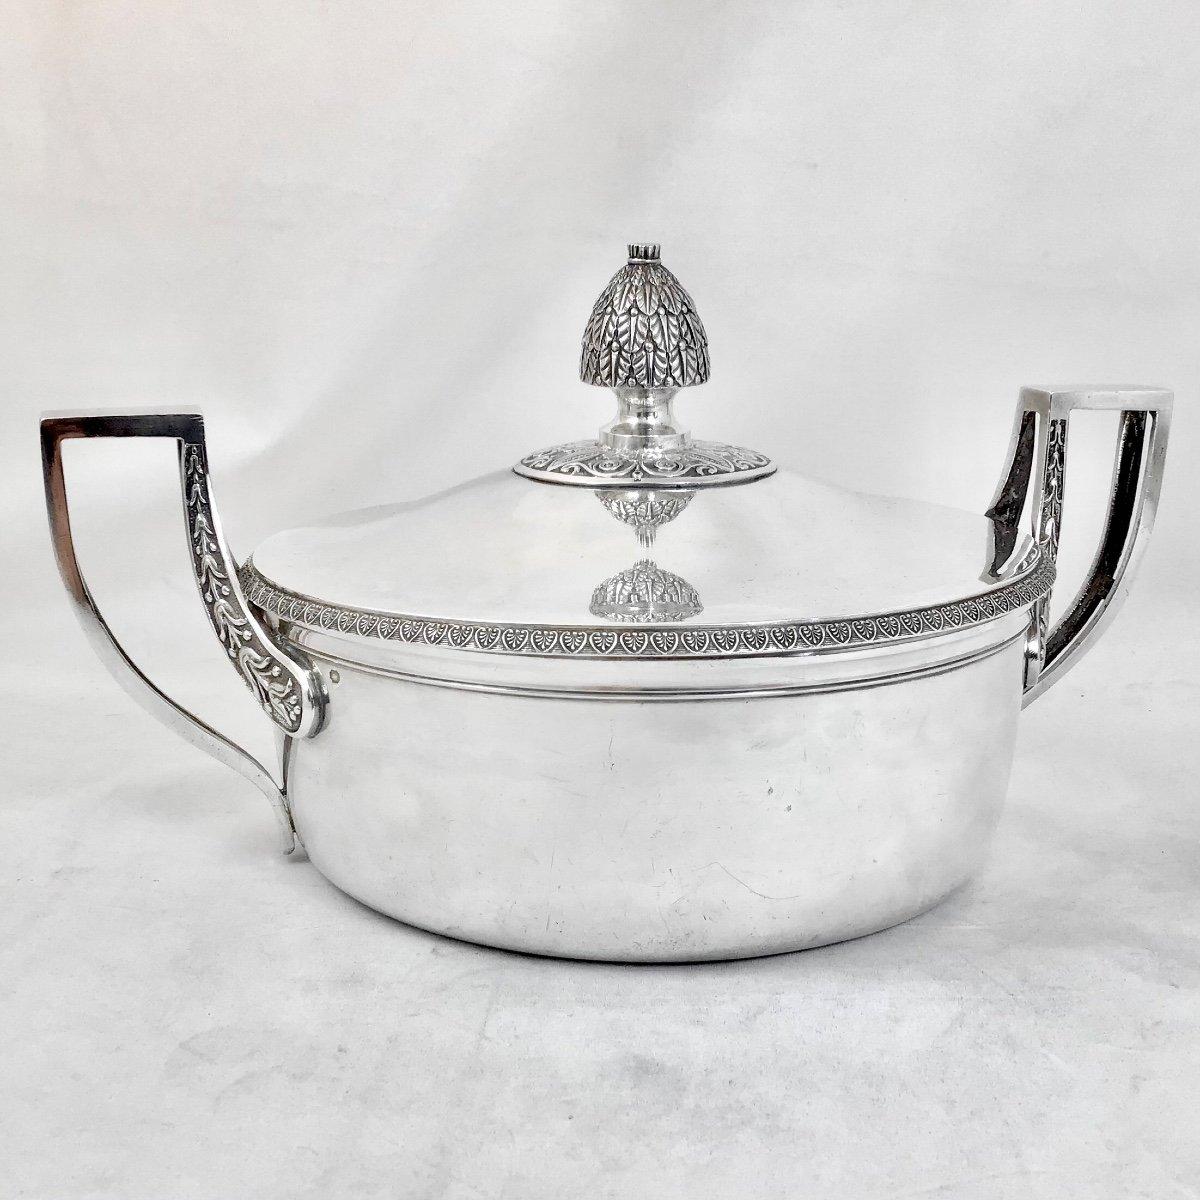 Sterling Silver Vegetable Dish, Empire Period, Paris 1809-1819, J.-b. Lefranc